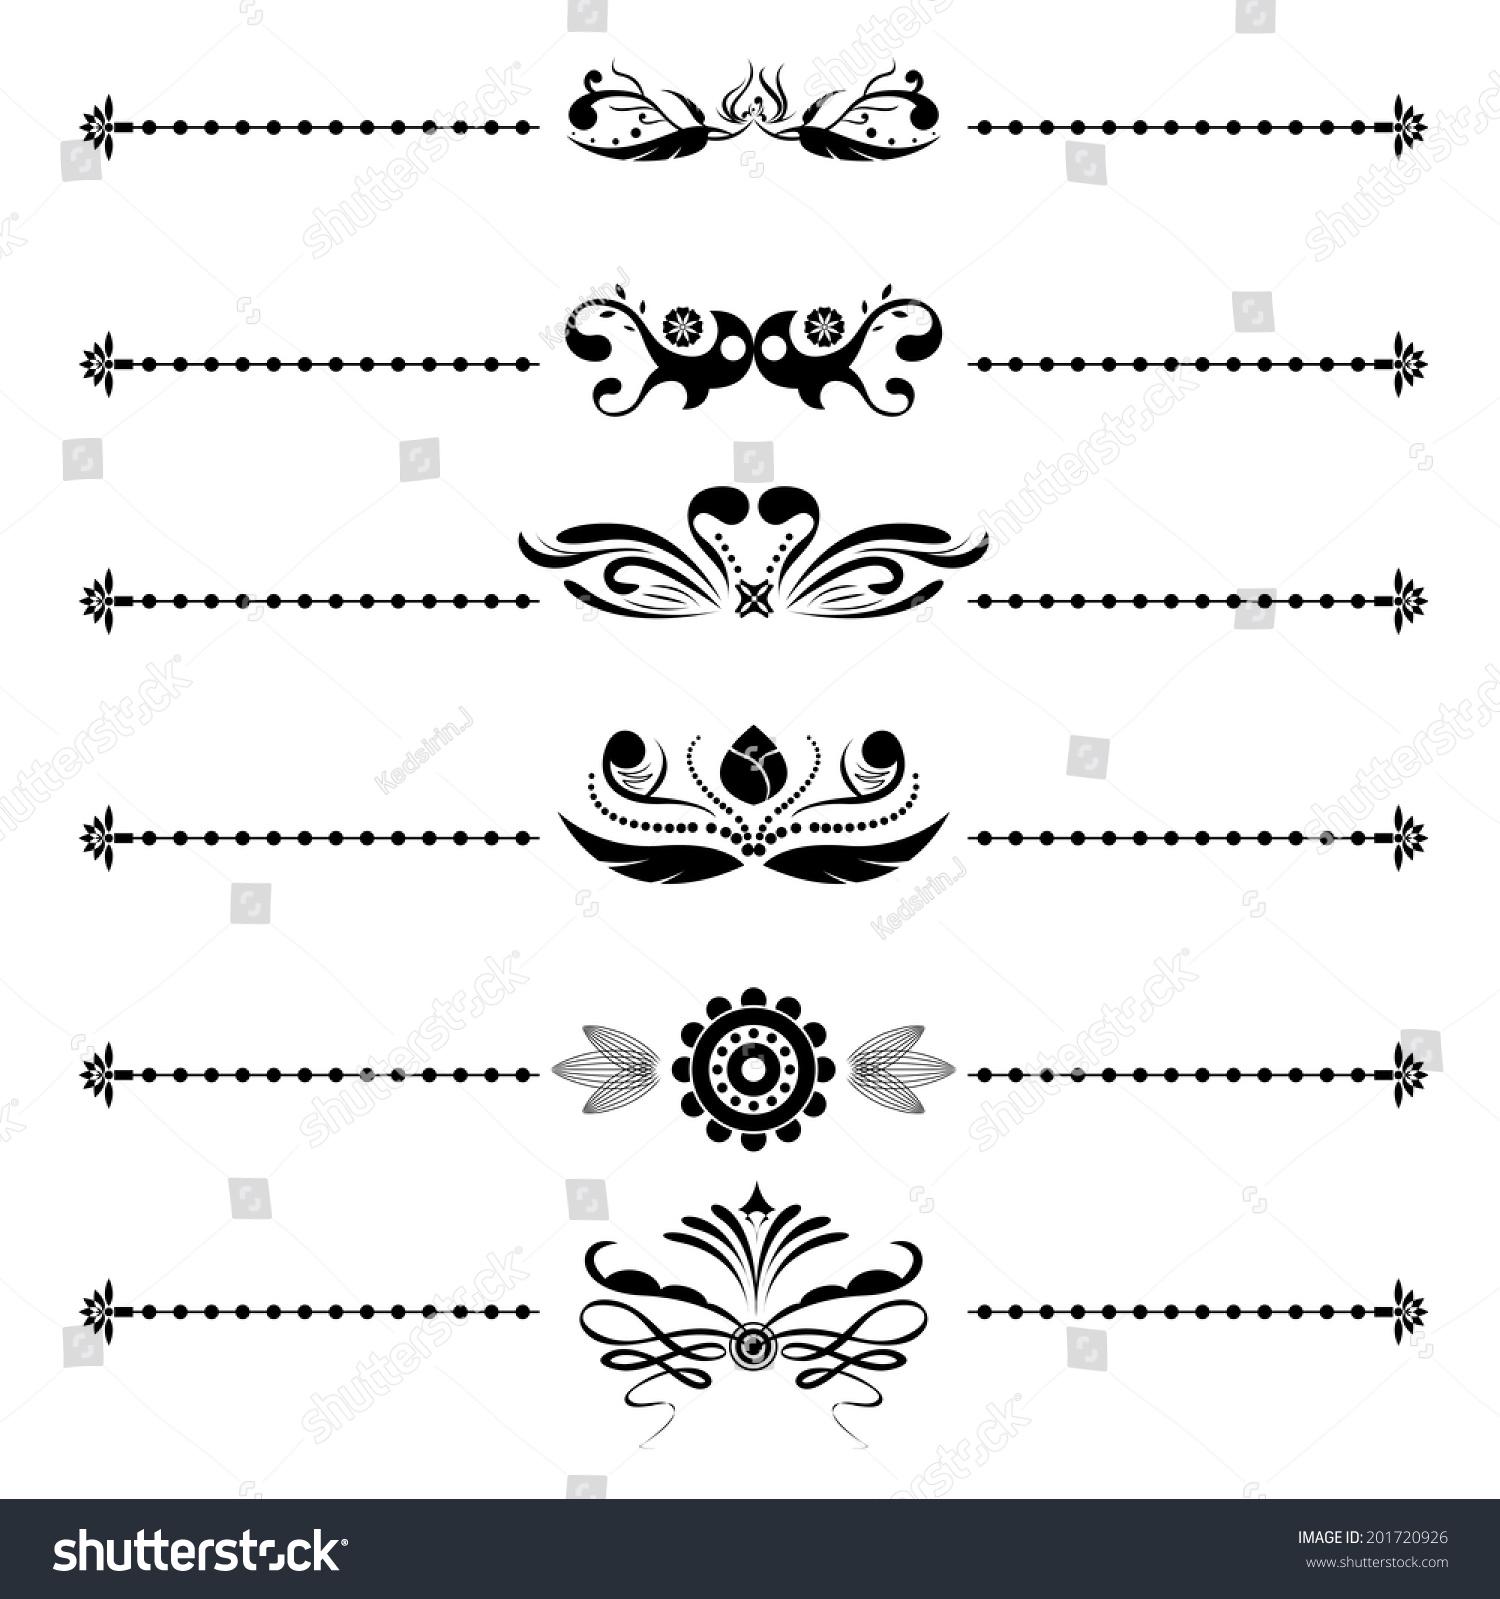 Calligraphic Vintage Floral Vector Designs Wedding Stock Vector ...